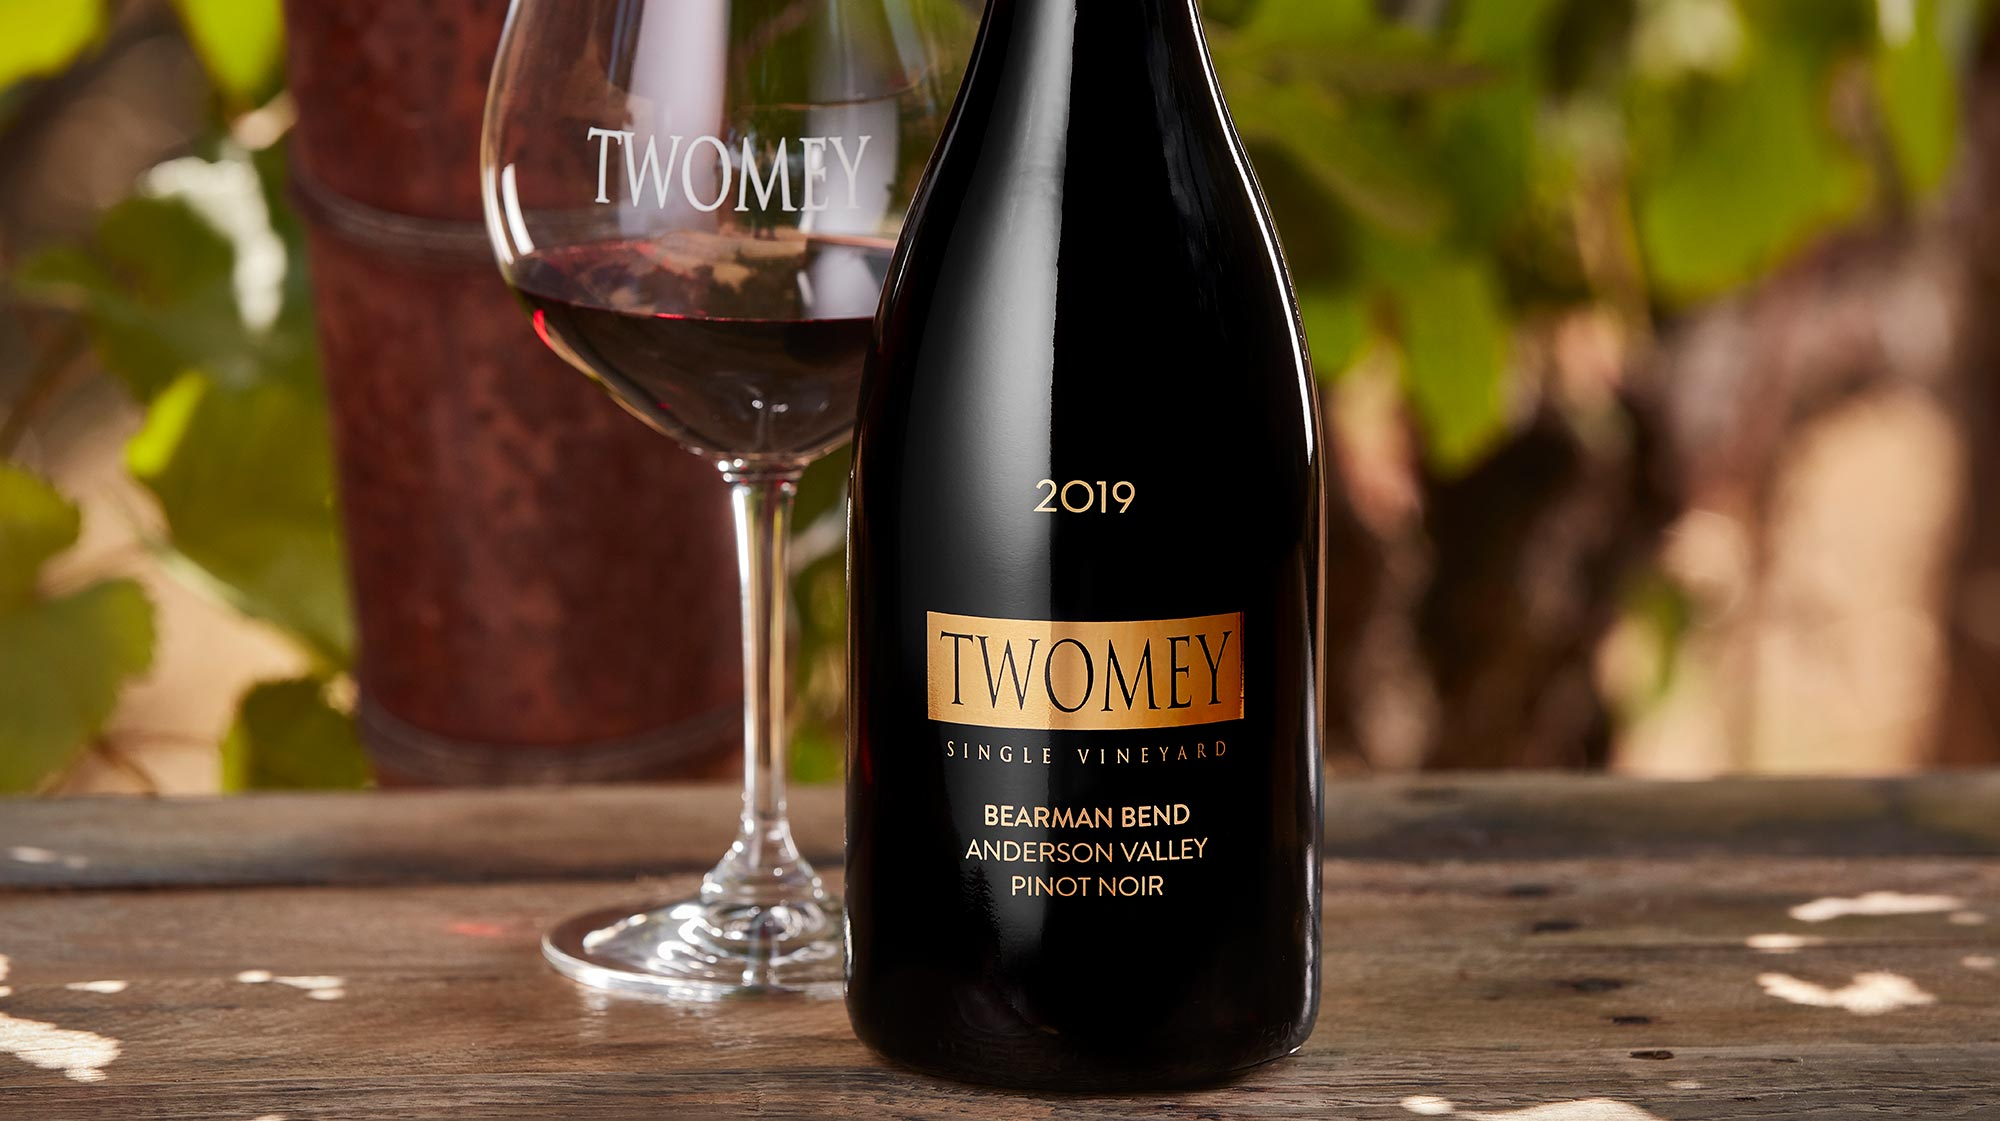 2019 Twomey Bearman Bend Vineyard Pinot Noir